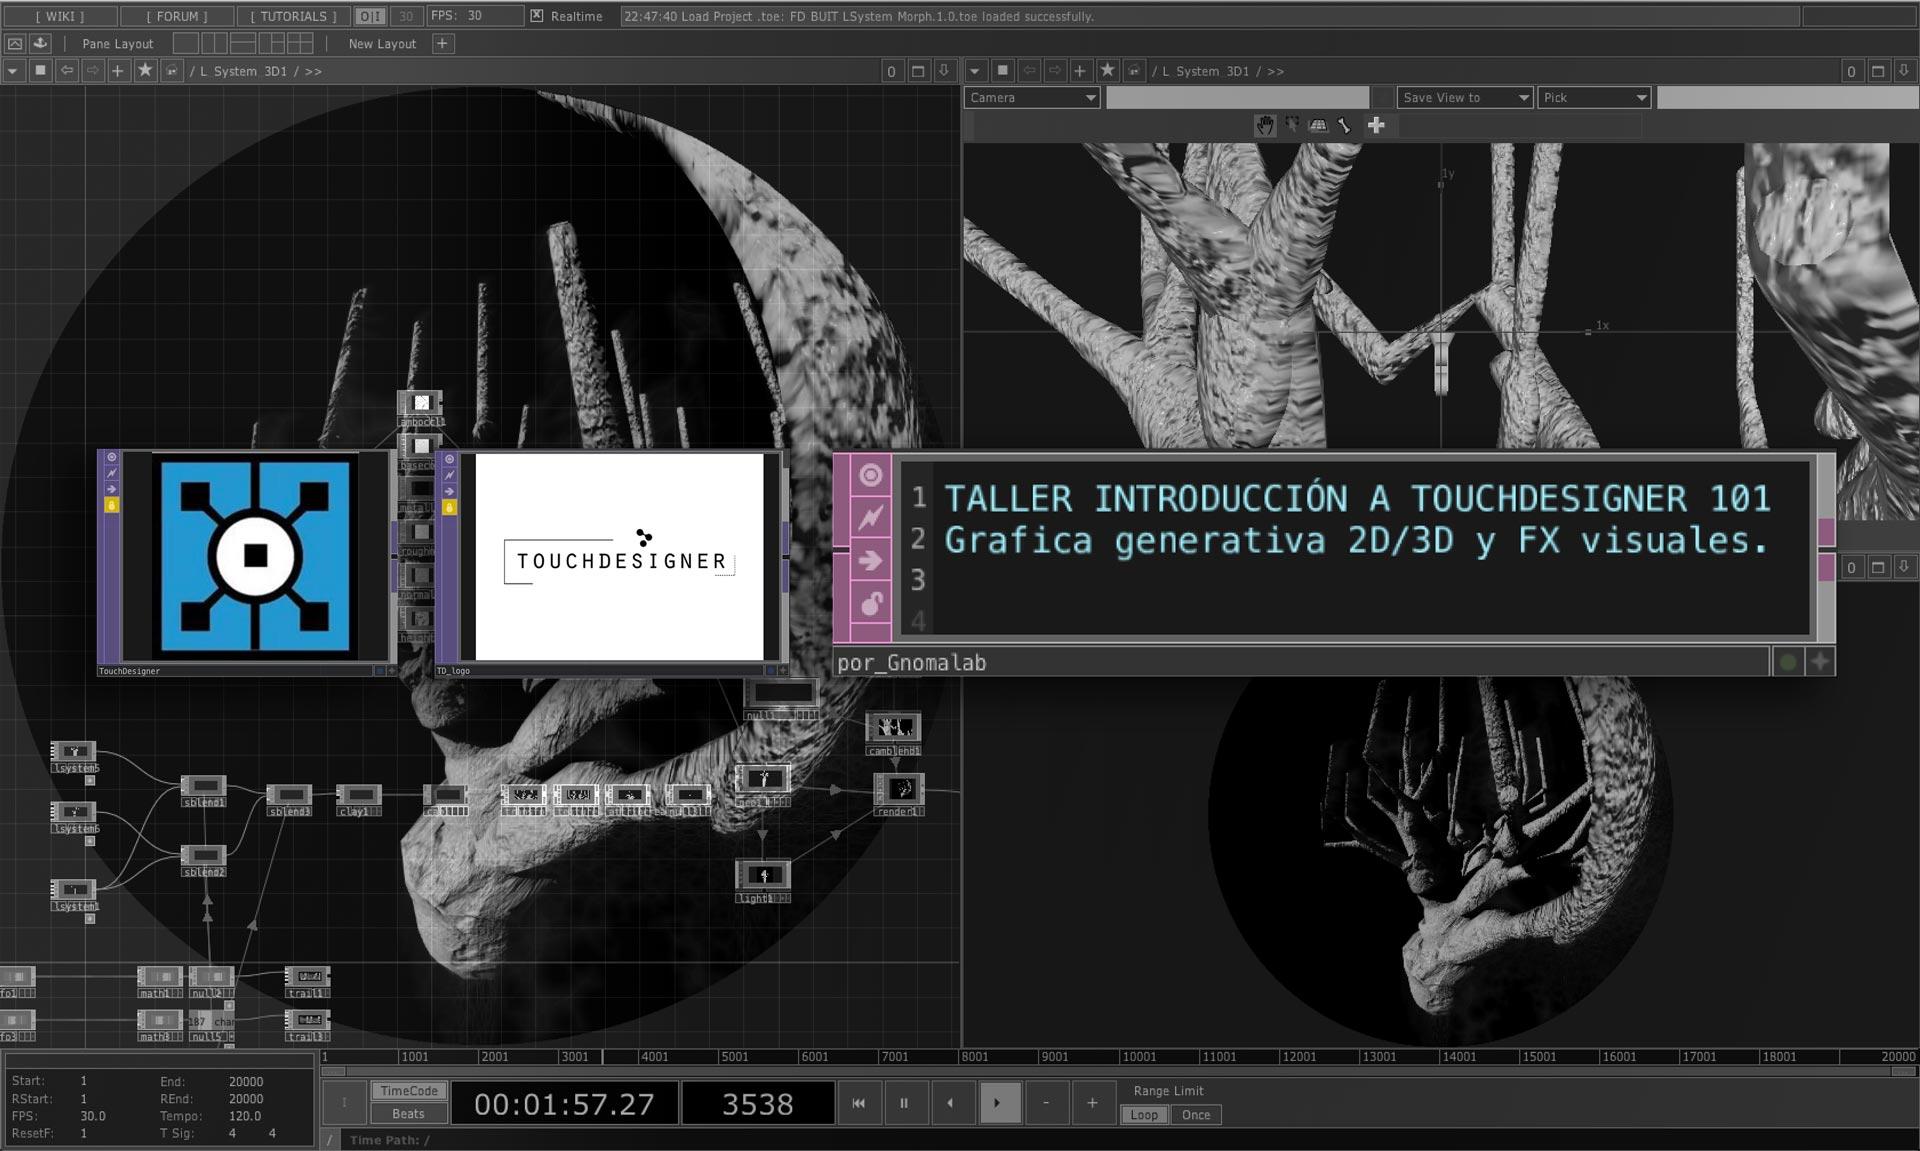 taller-touchdesigner-demo_0.jpg